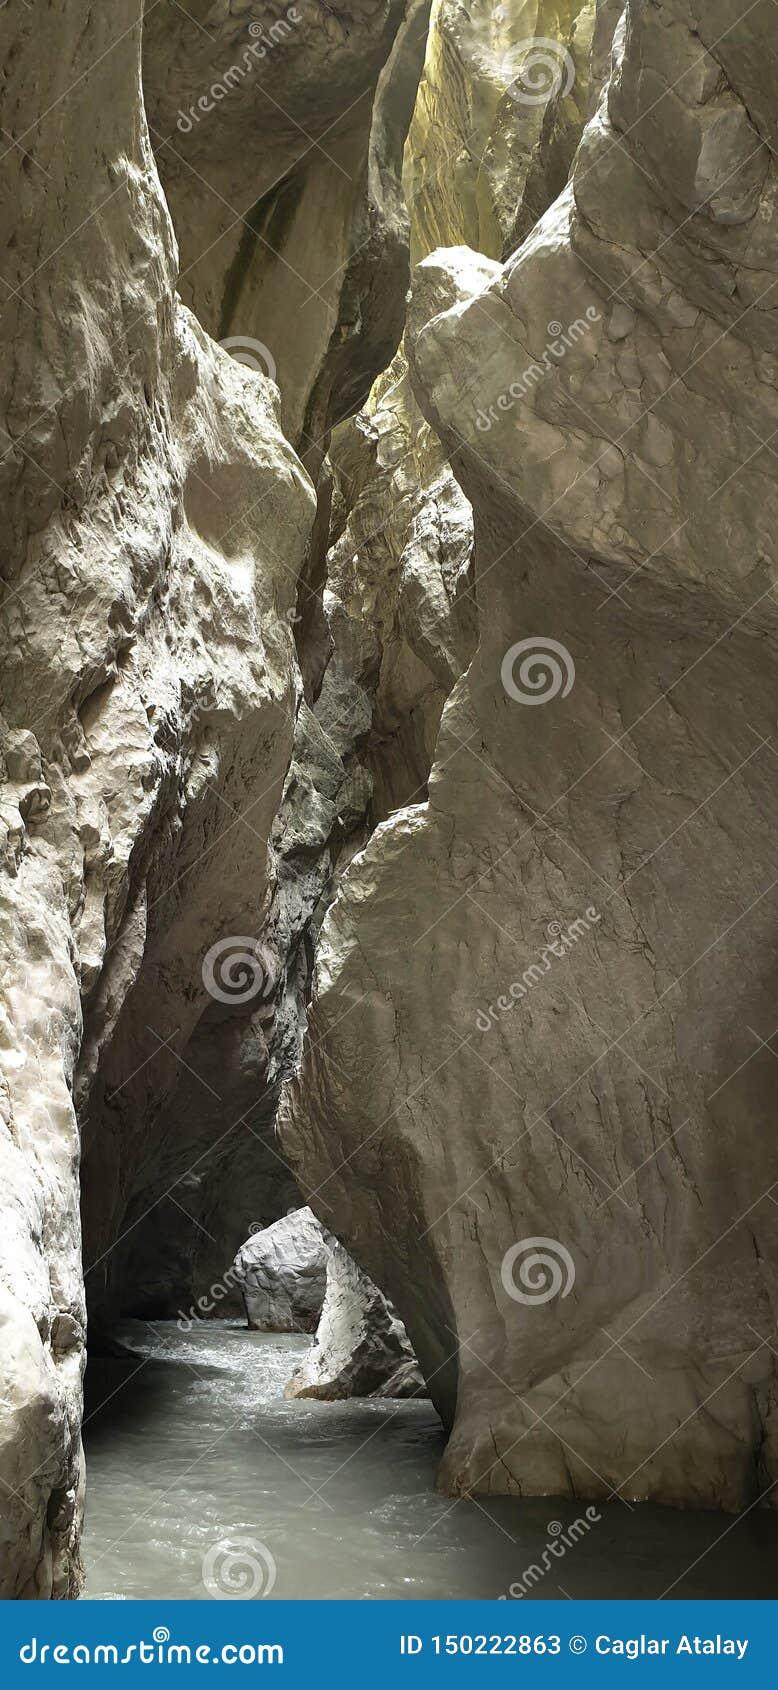 Dentro la valle nascosta